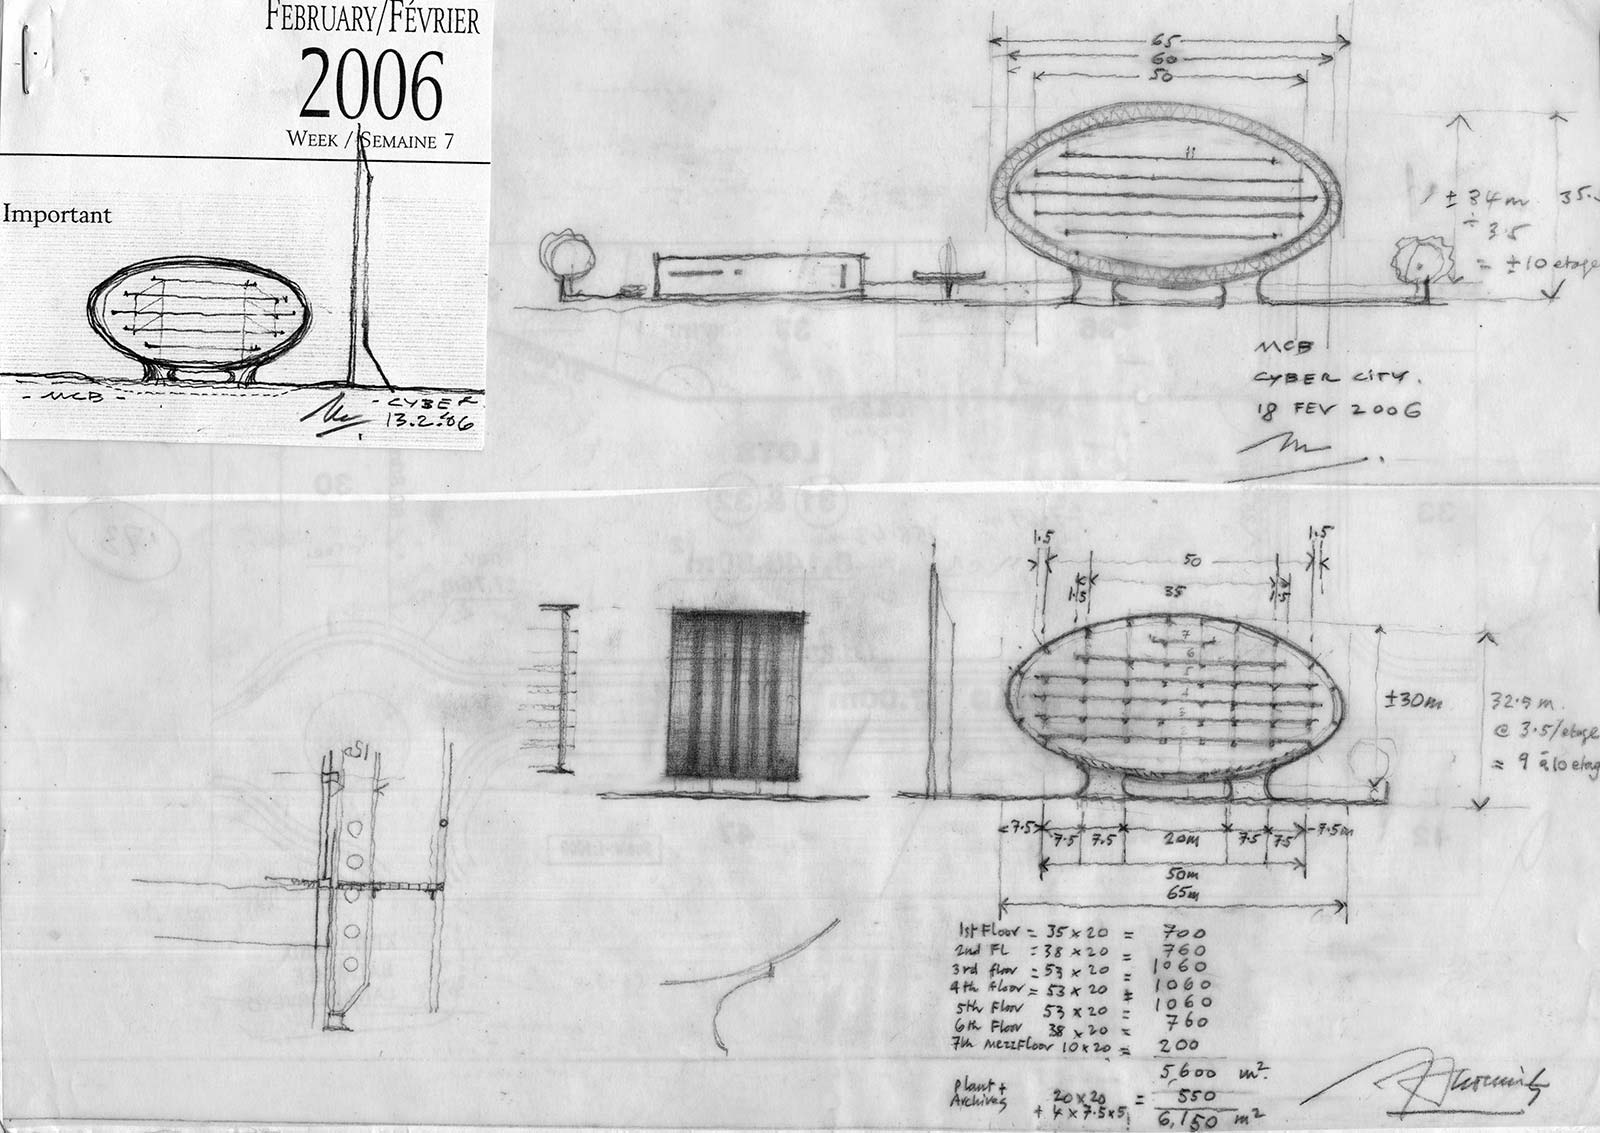 the-mauritius-commercial-bank-ebene-jean-francois-koenig-sketches